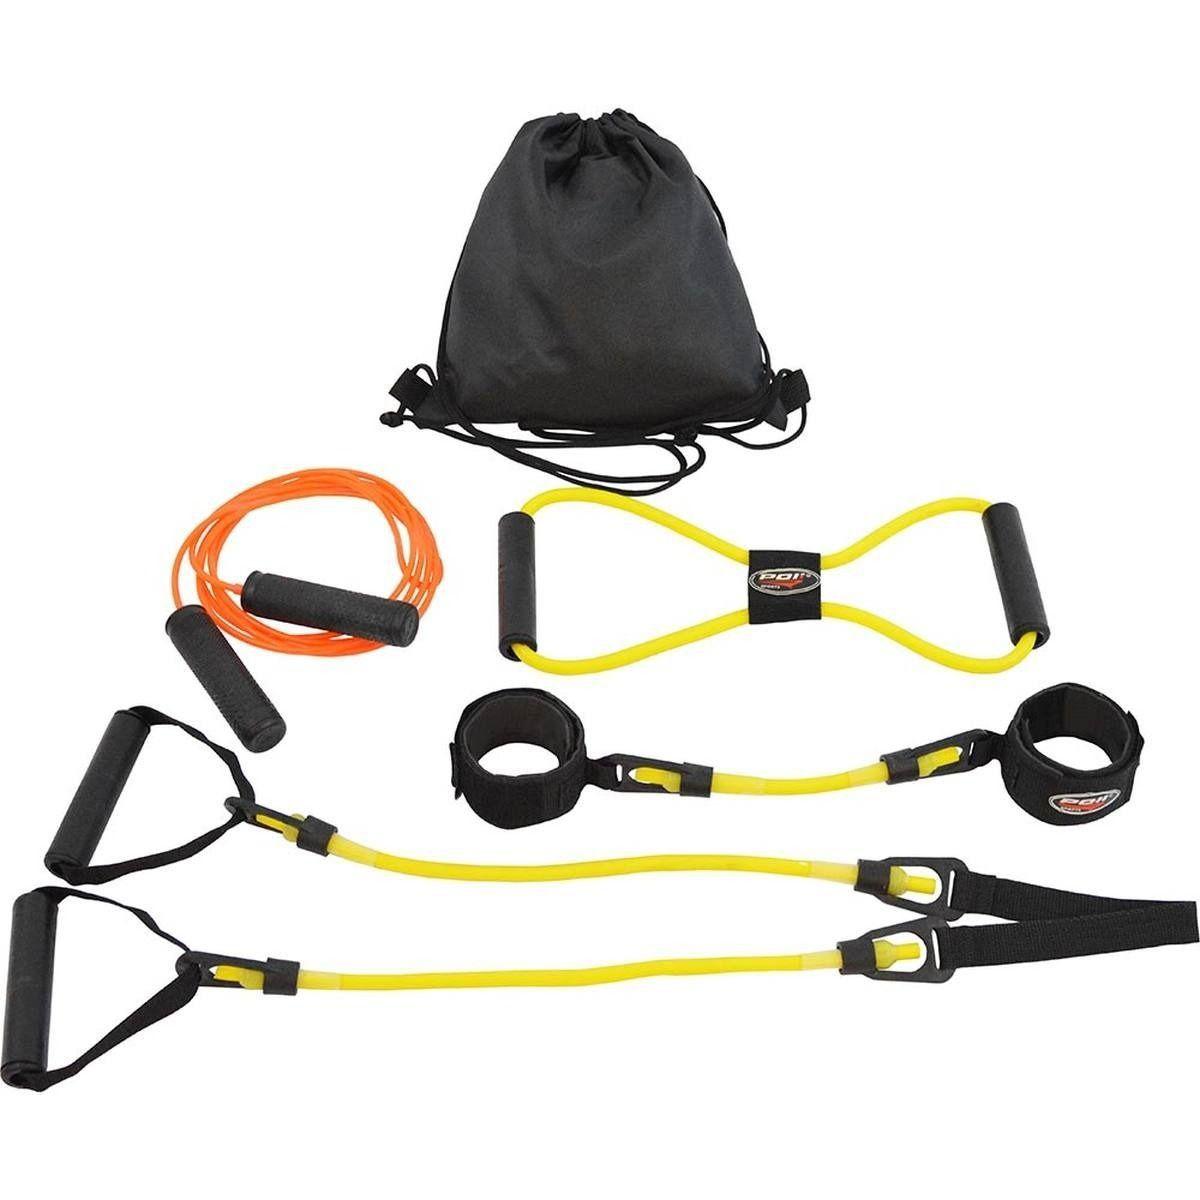 Kit Treinamento Funcional Baixa Intensidade Amarelo Polimet